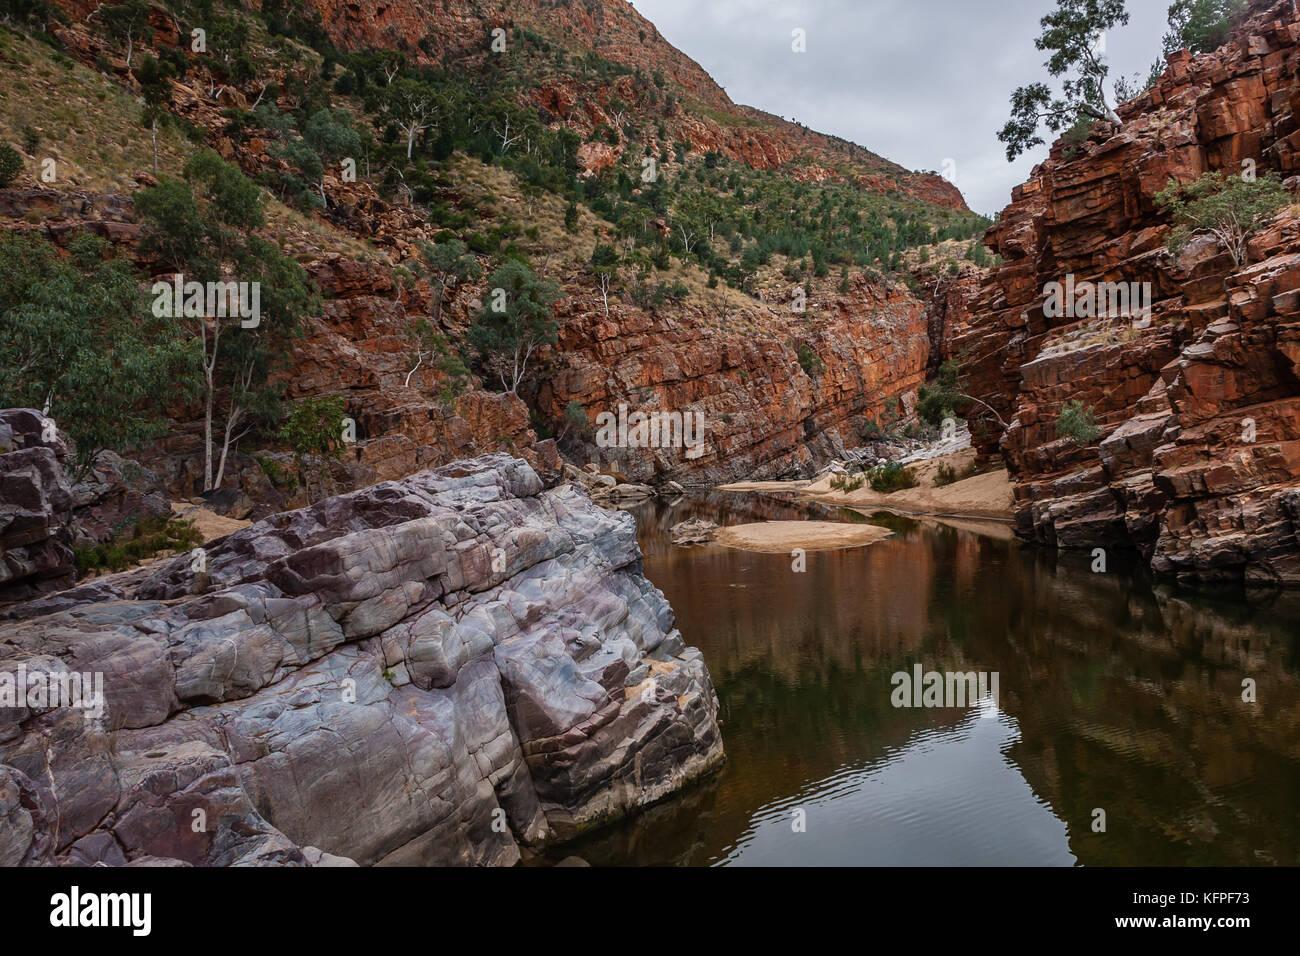 Ormiston Gorge, West MacDonnell Range National Park, Northern Territory, Australia - Stock Image